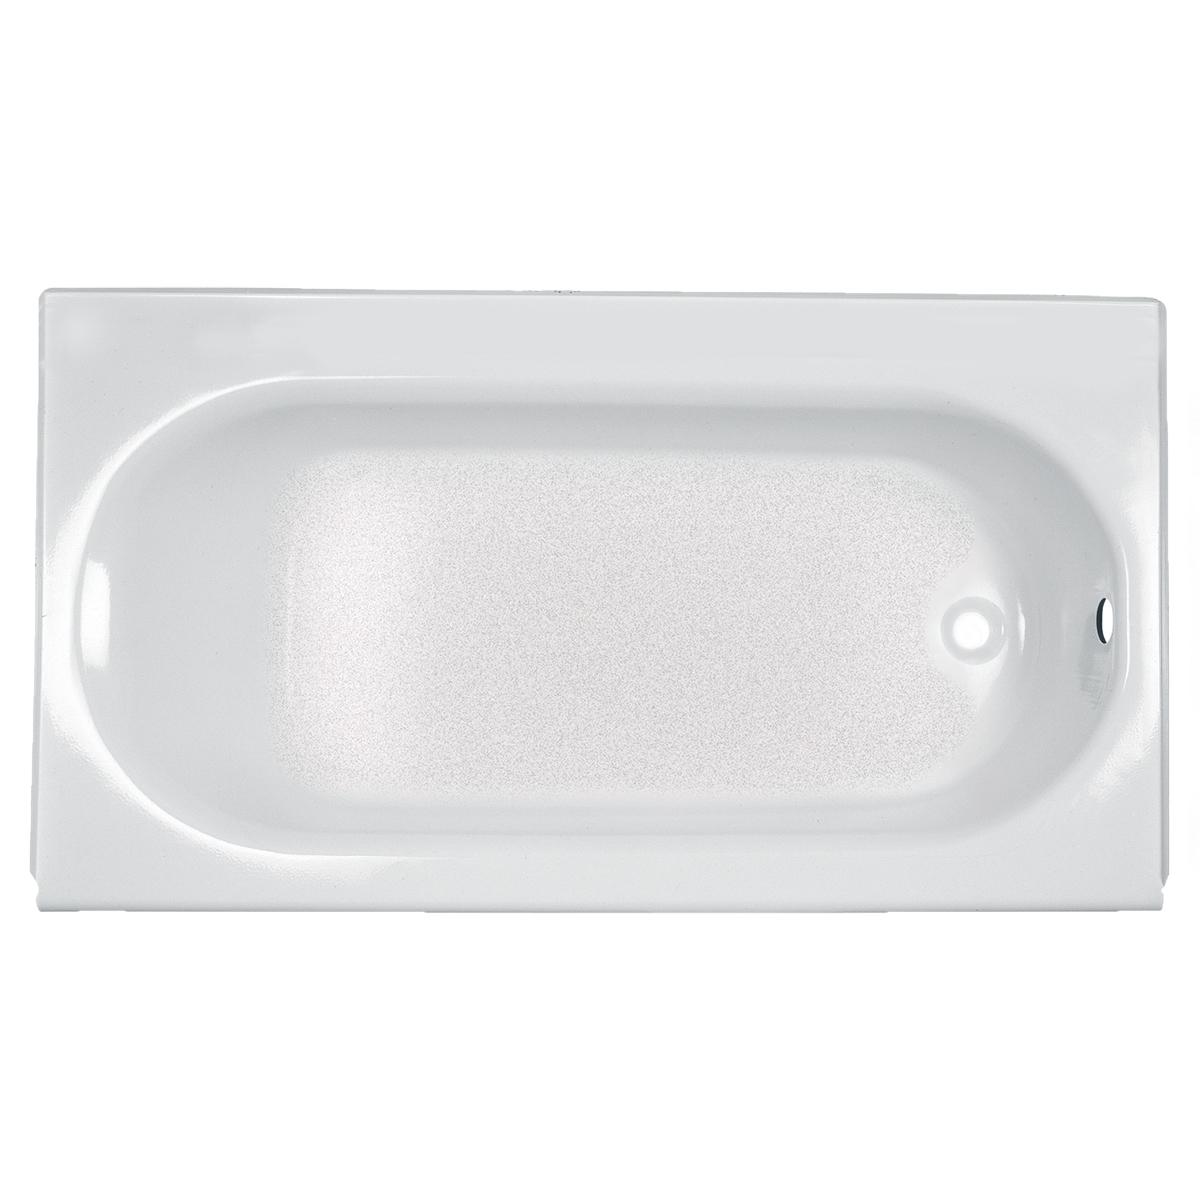 American Standard 2391202.020 Bathtub, Princeton™, Soaking, Rectangular Shape, 60 in L x 30 in W, Right Drain, Glossy White, Import